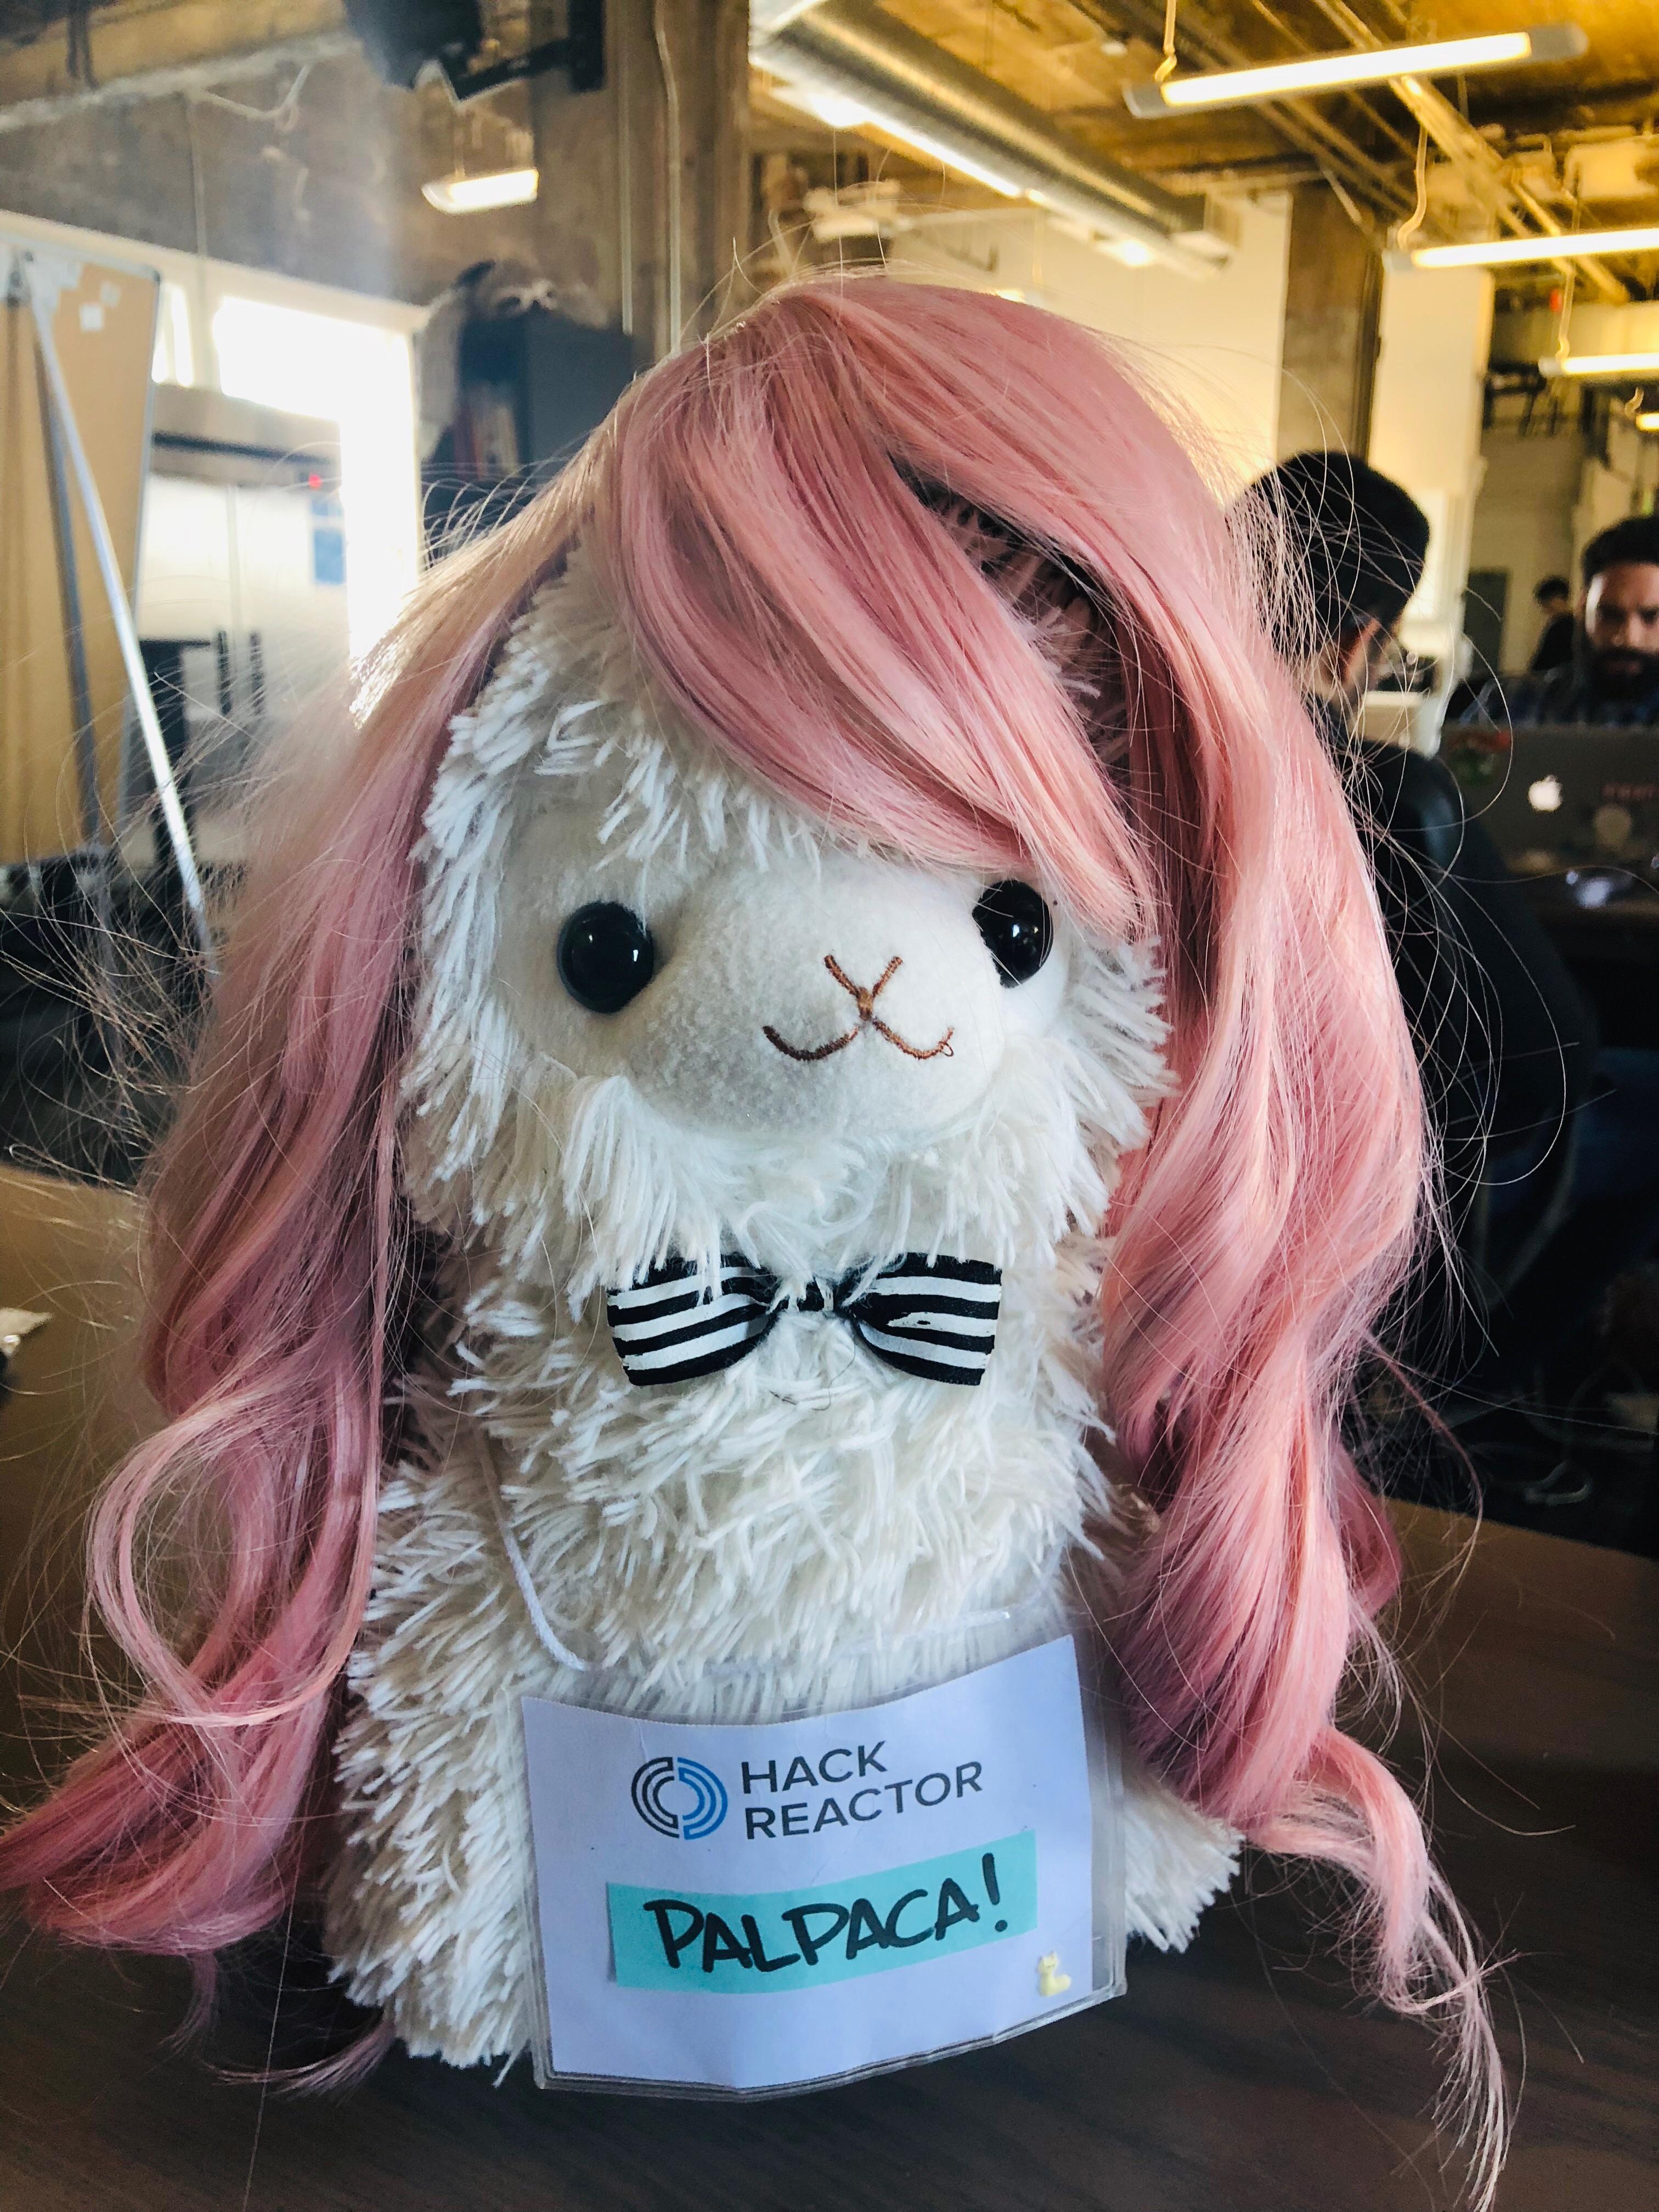 A plush alpaca wearing a pink wig